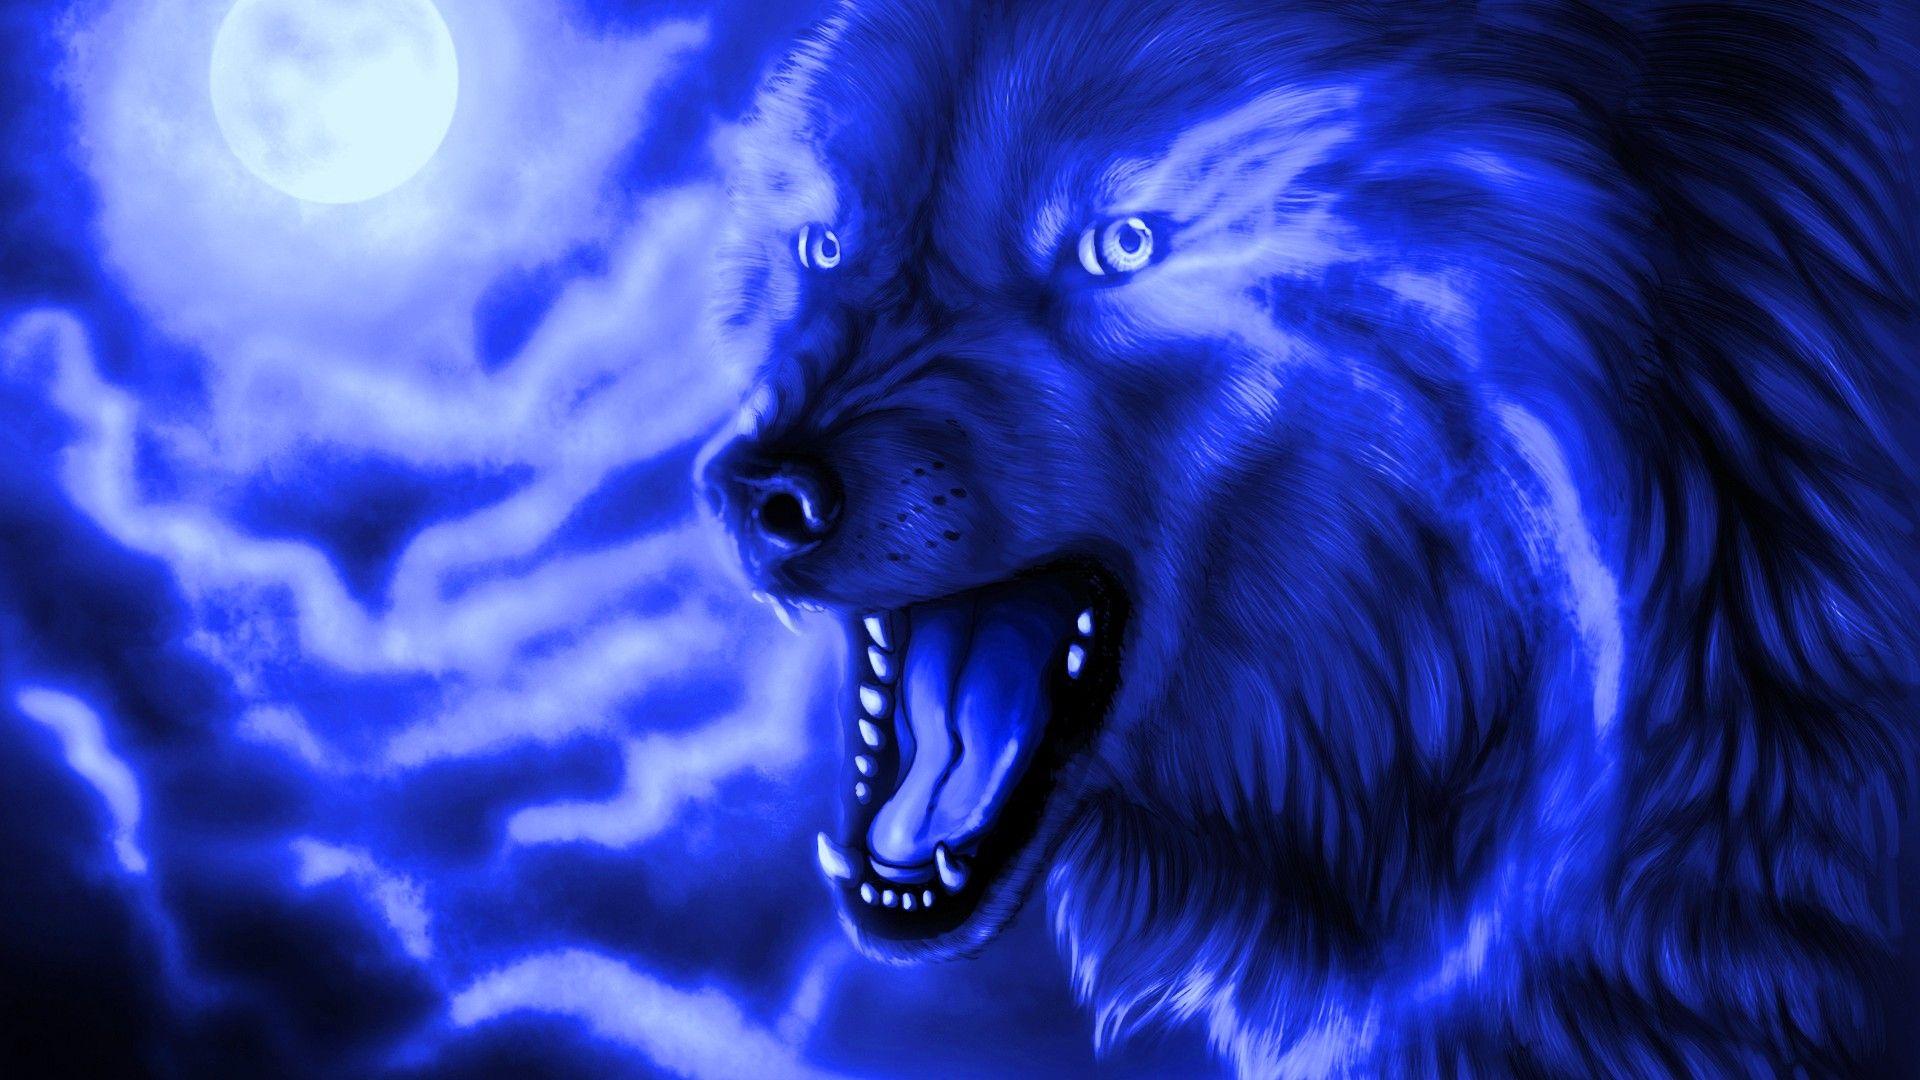 Cool Wolf Wallpaper Hd 2021 Live Wallpaper Hd Cool Wolf Wallpaper Wolf Wallpaper Live Wallpaper Hd